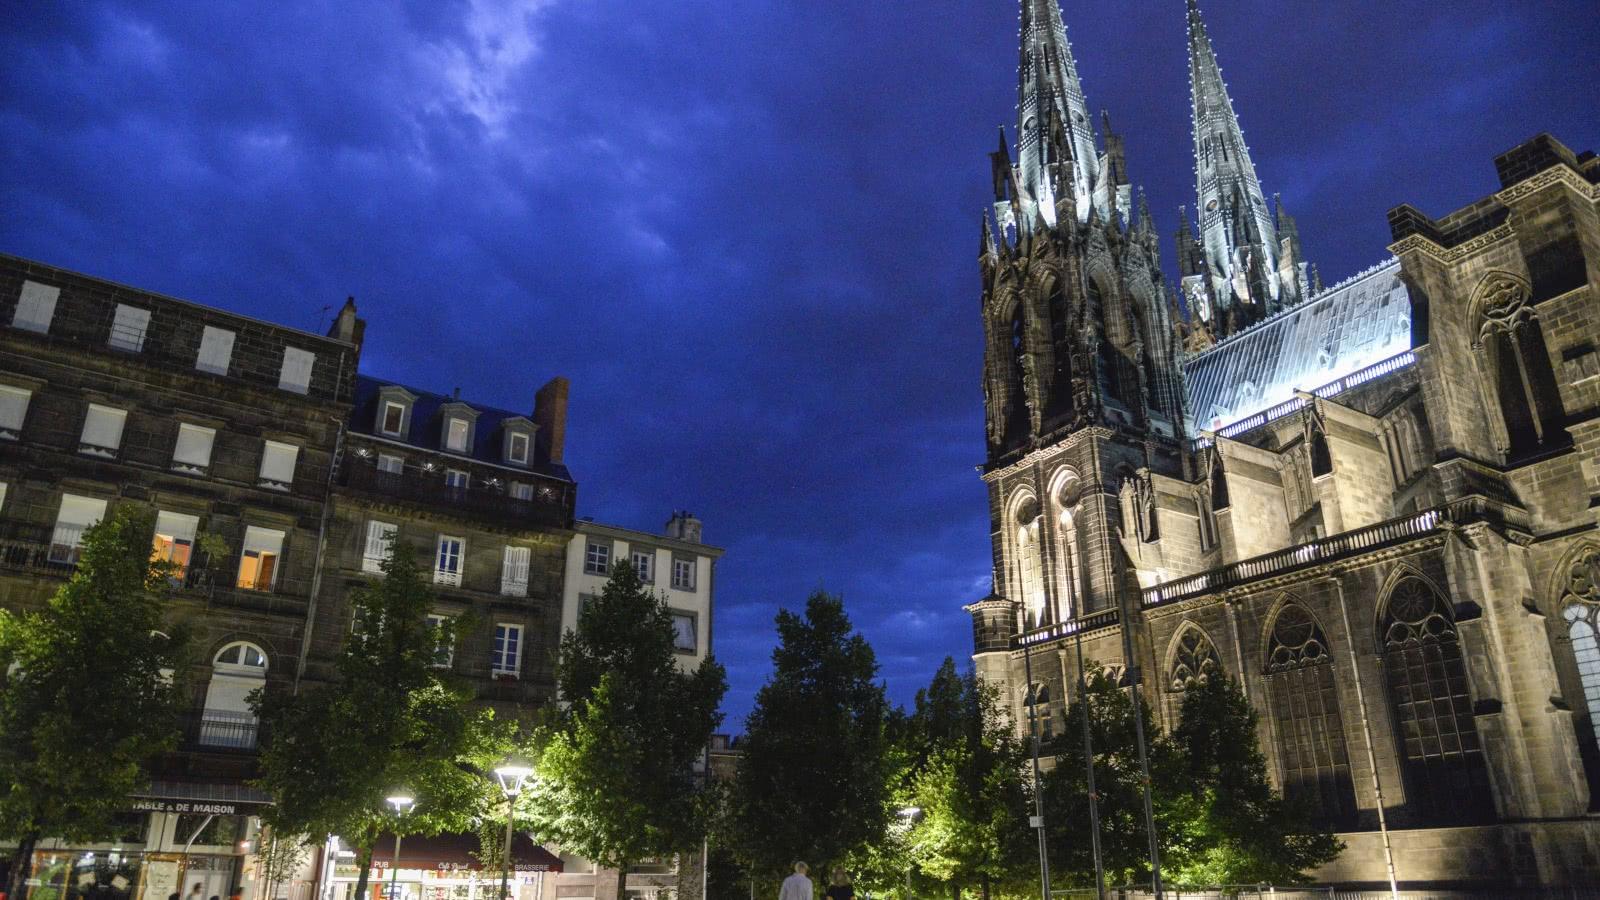 Cathedrale Clermont-Ferrand nuit tombée